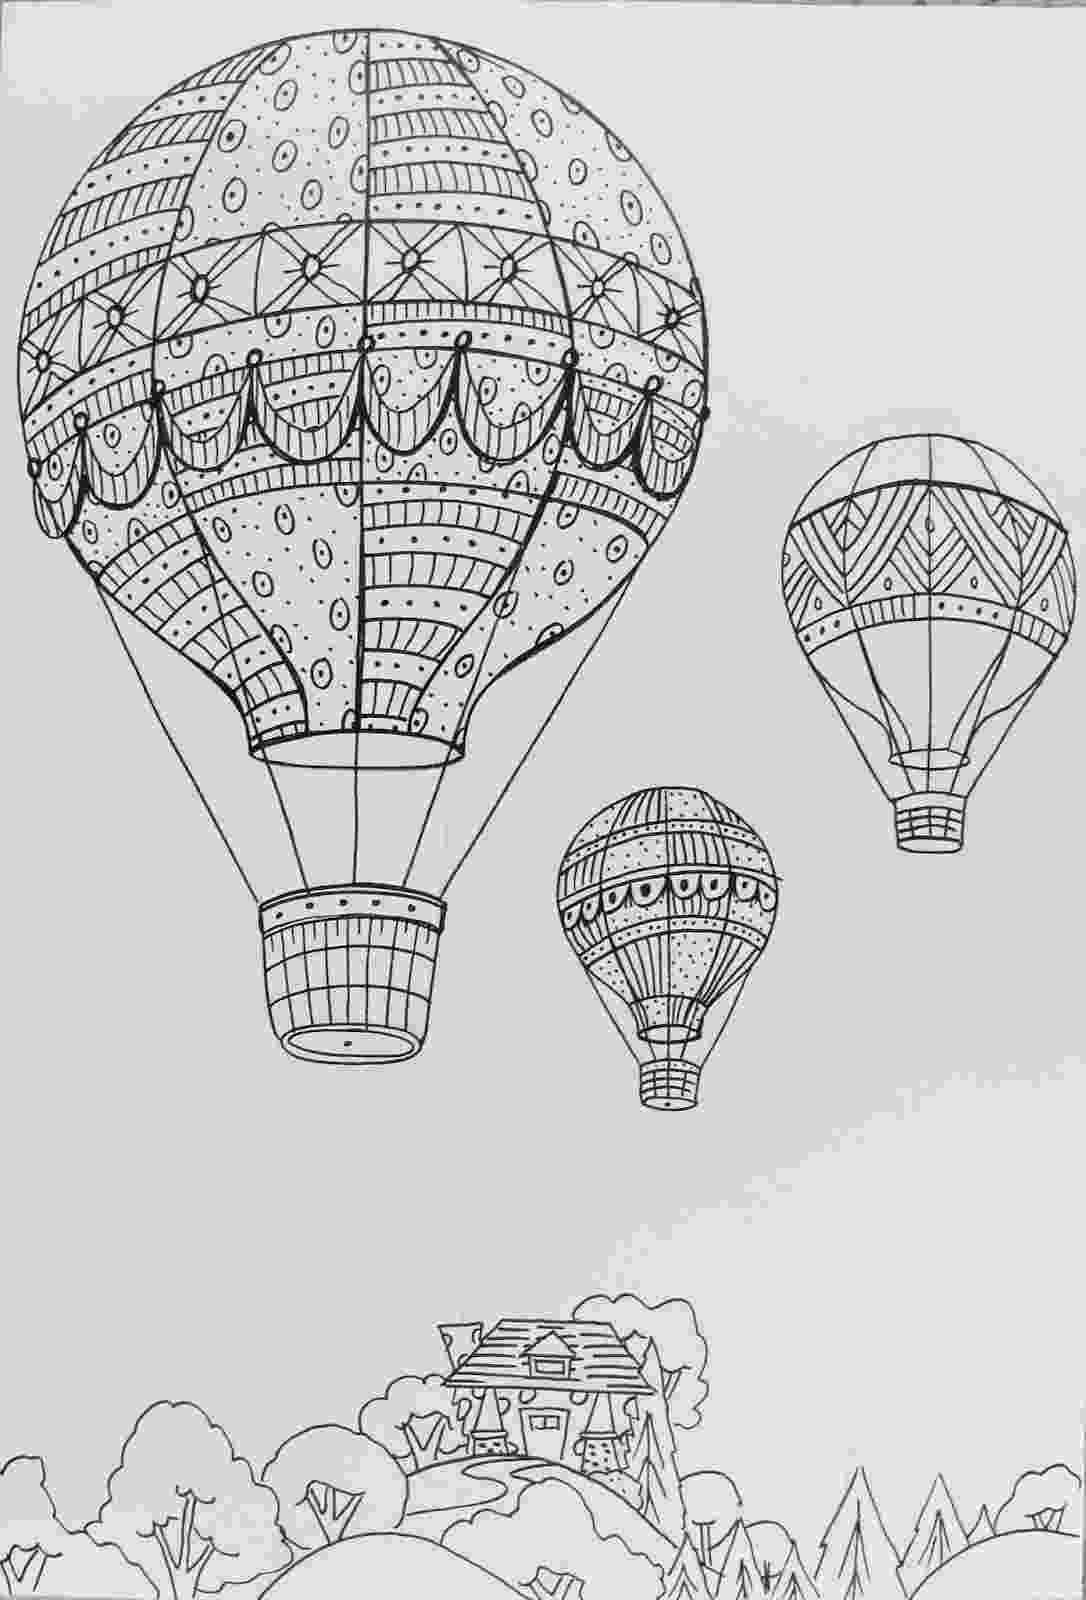 balloon sketch balloons sketch balloon sketch